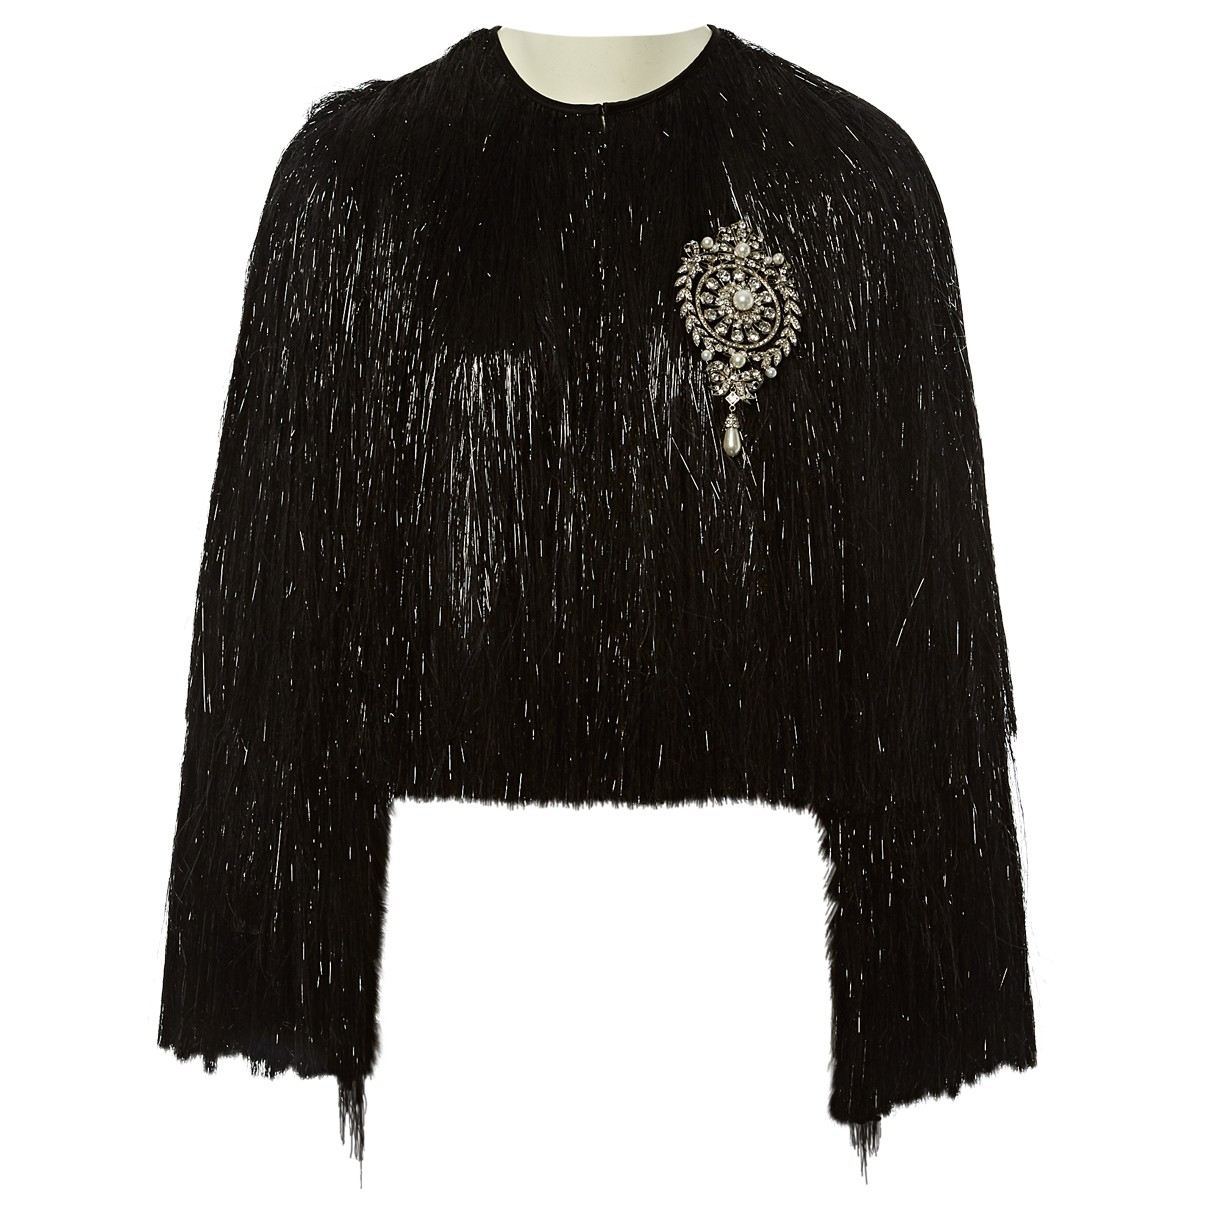 Givenchy \N Black jacket for Women 40 FR